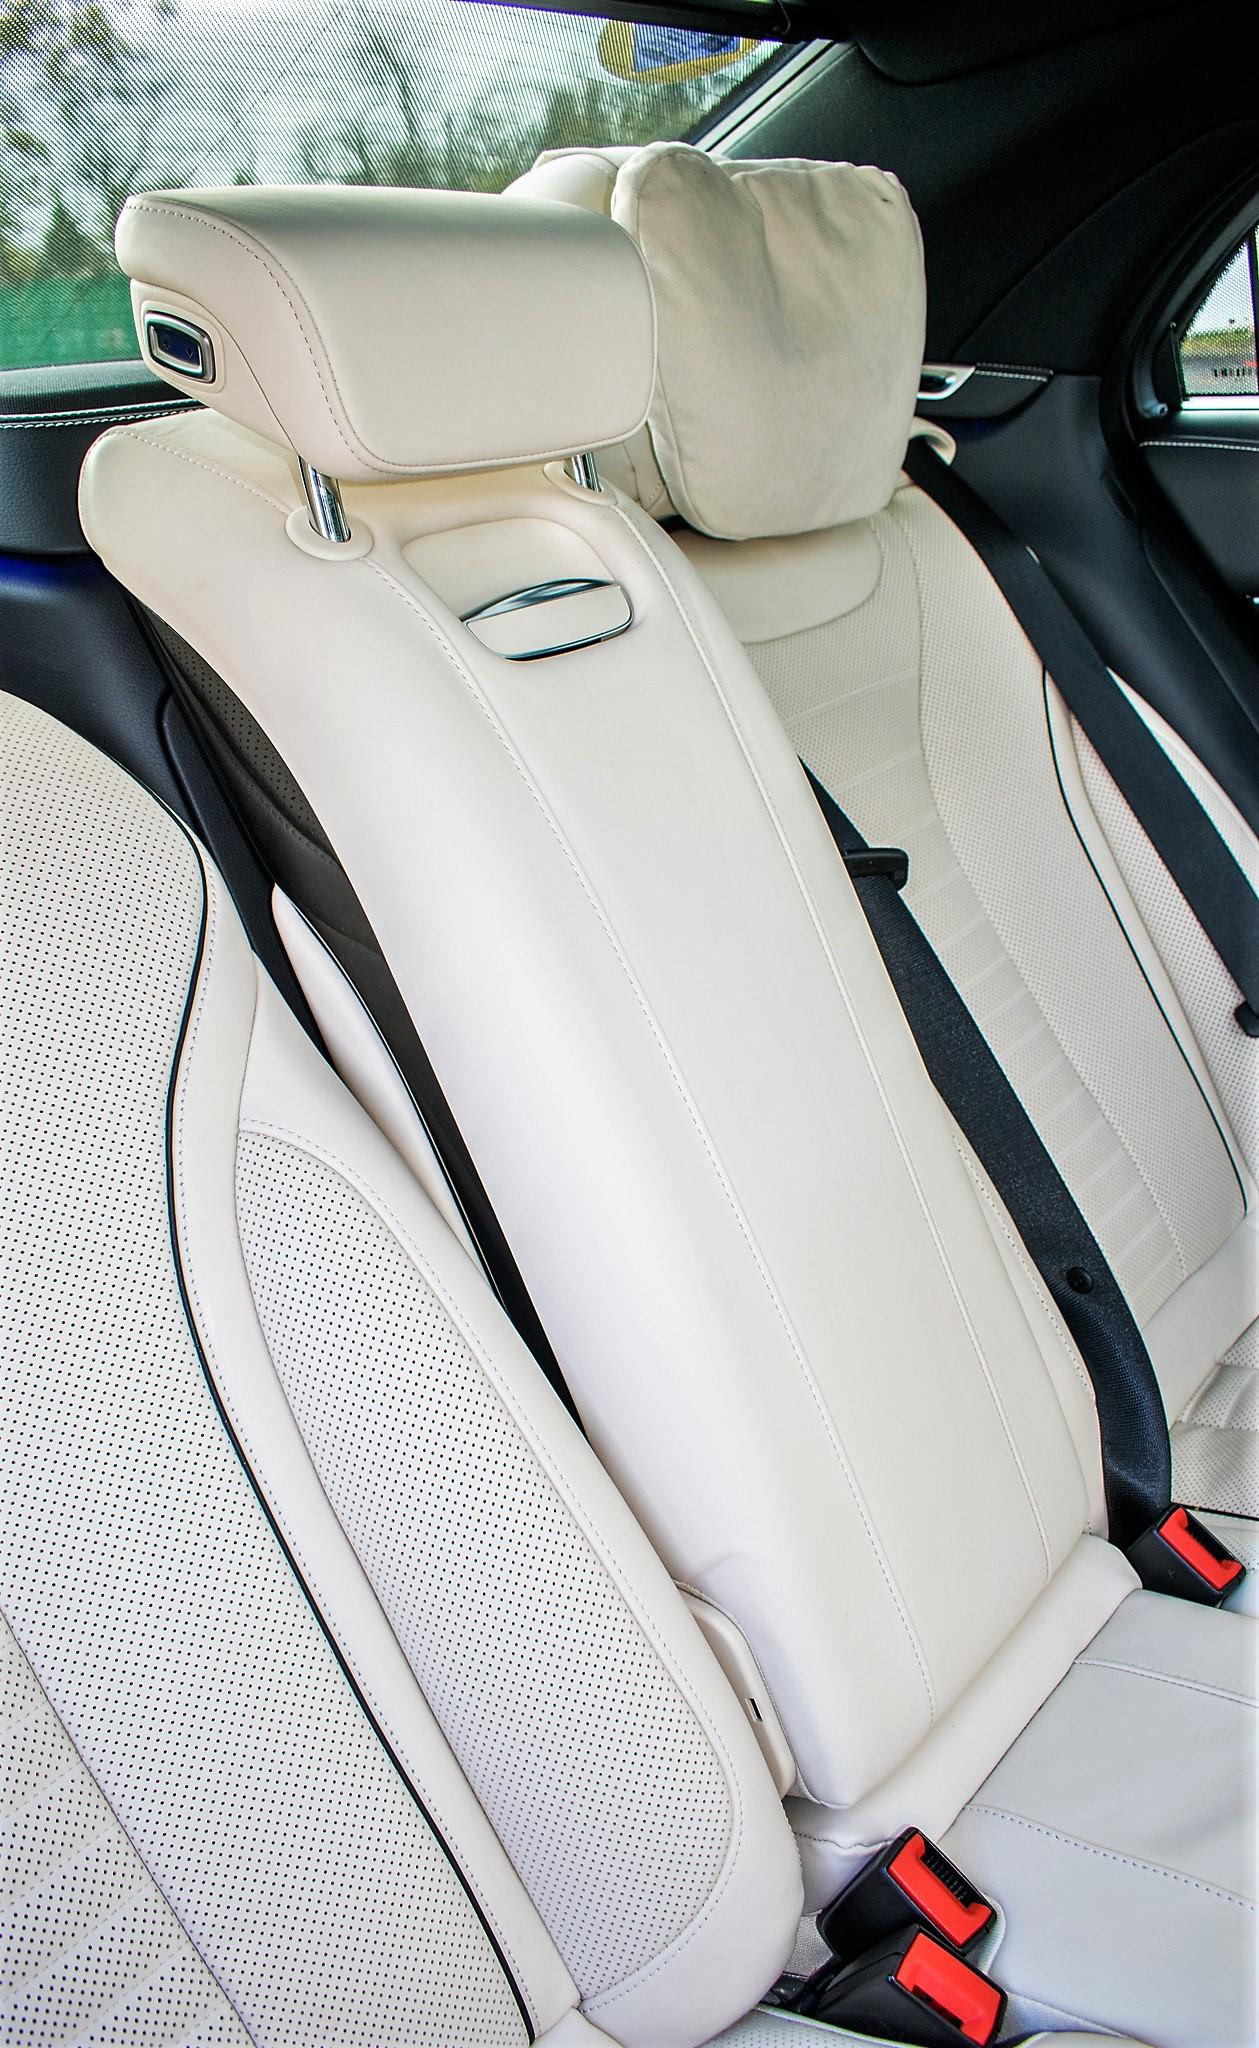 Mercedes Benz S450 L AMG Line Executive auto petrol 4 door saloon car Registration Number: FX68 - Image 25 of 30